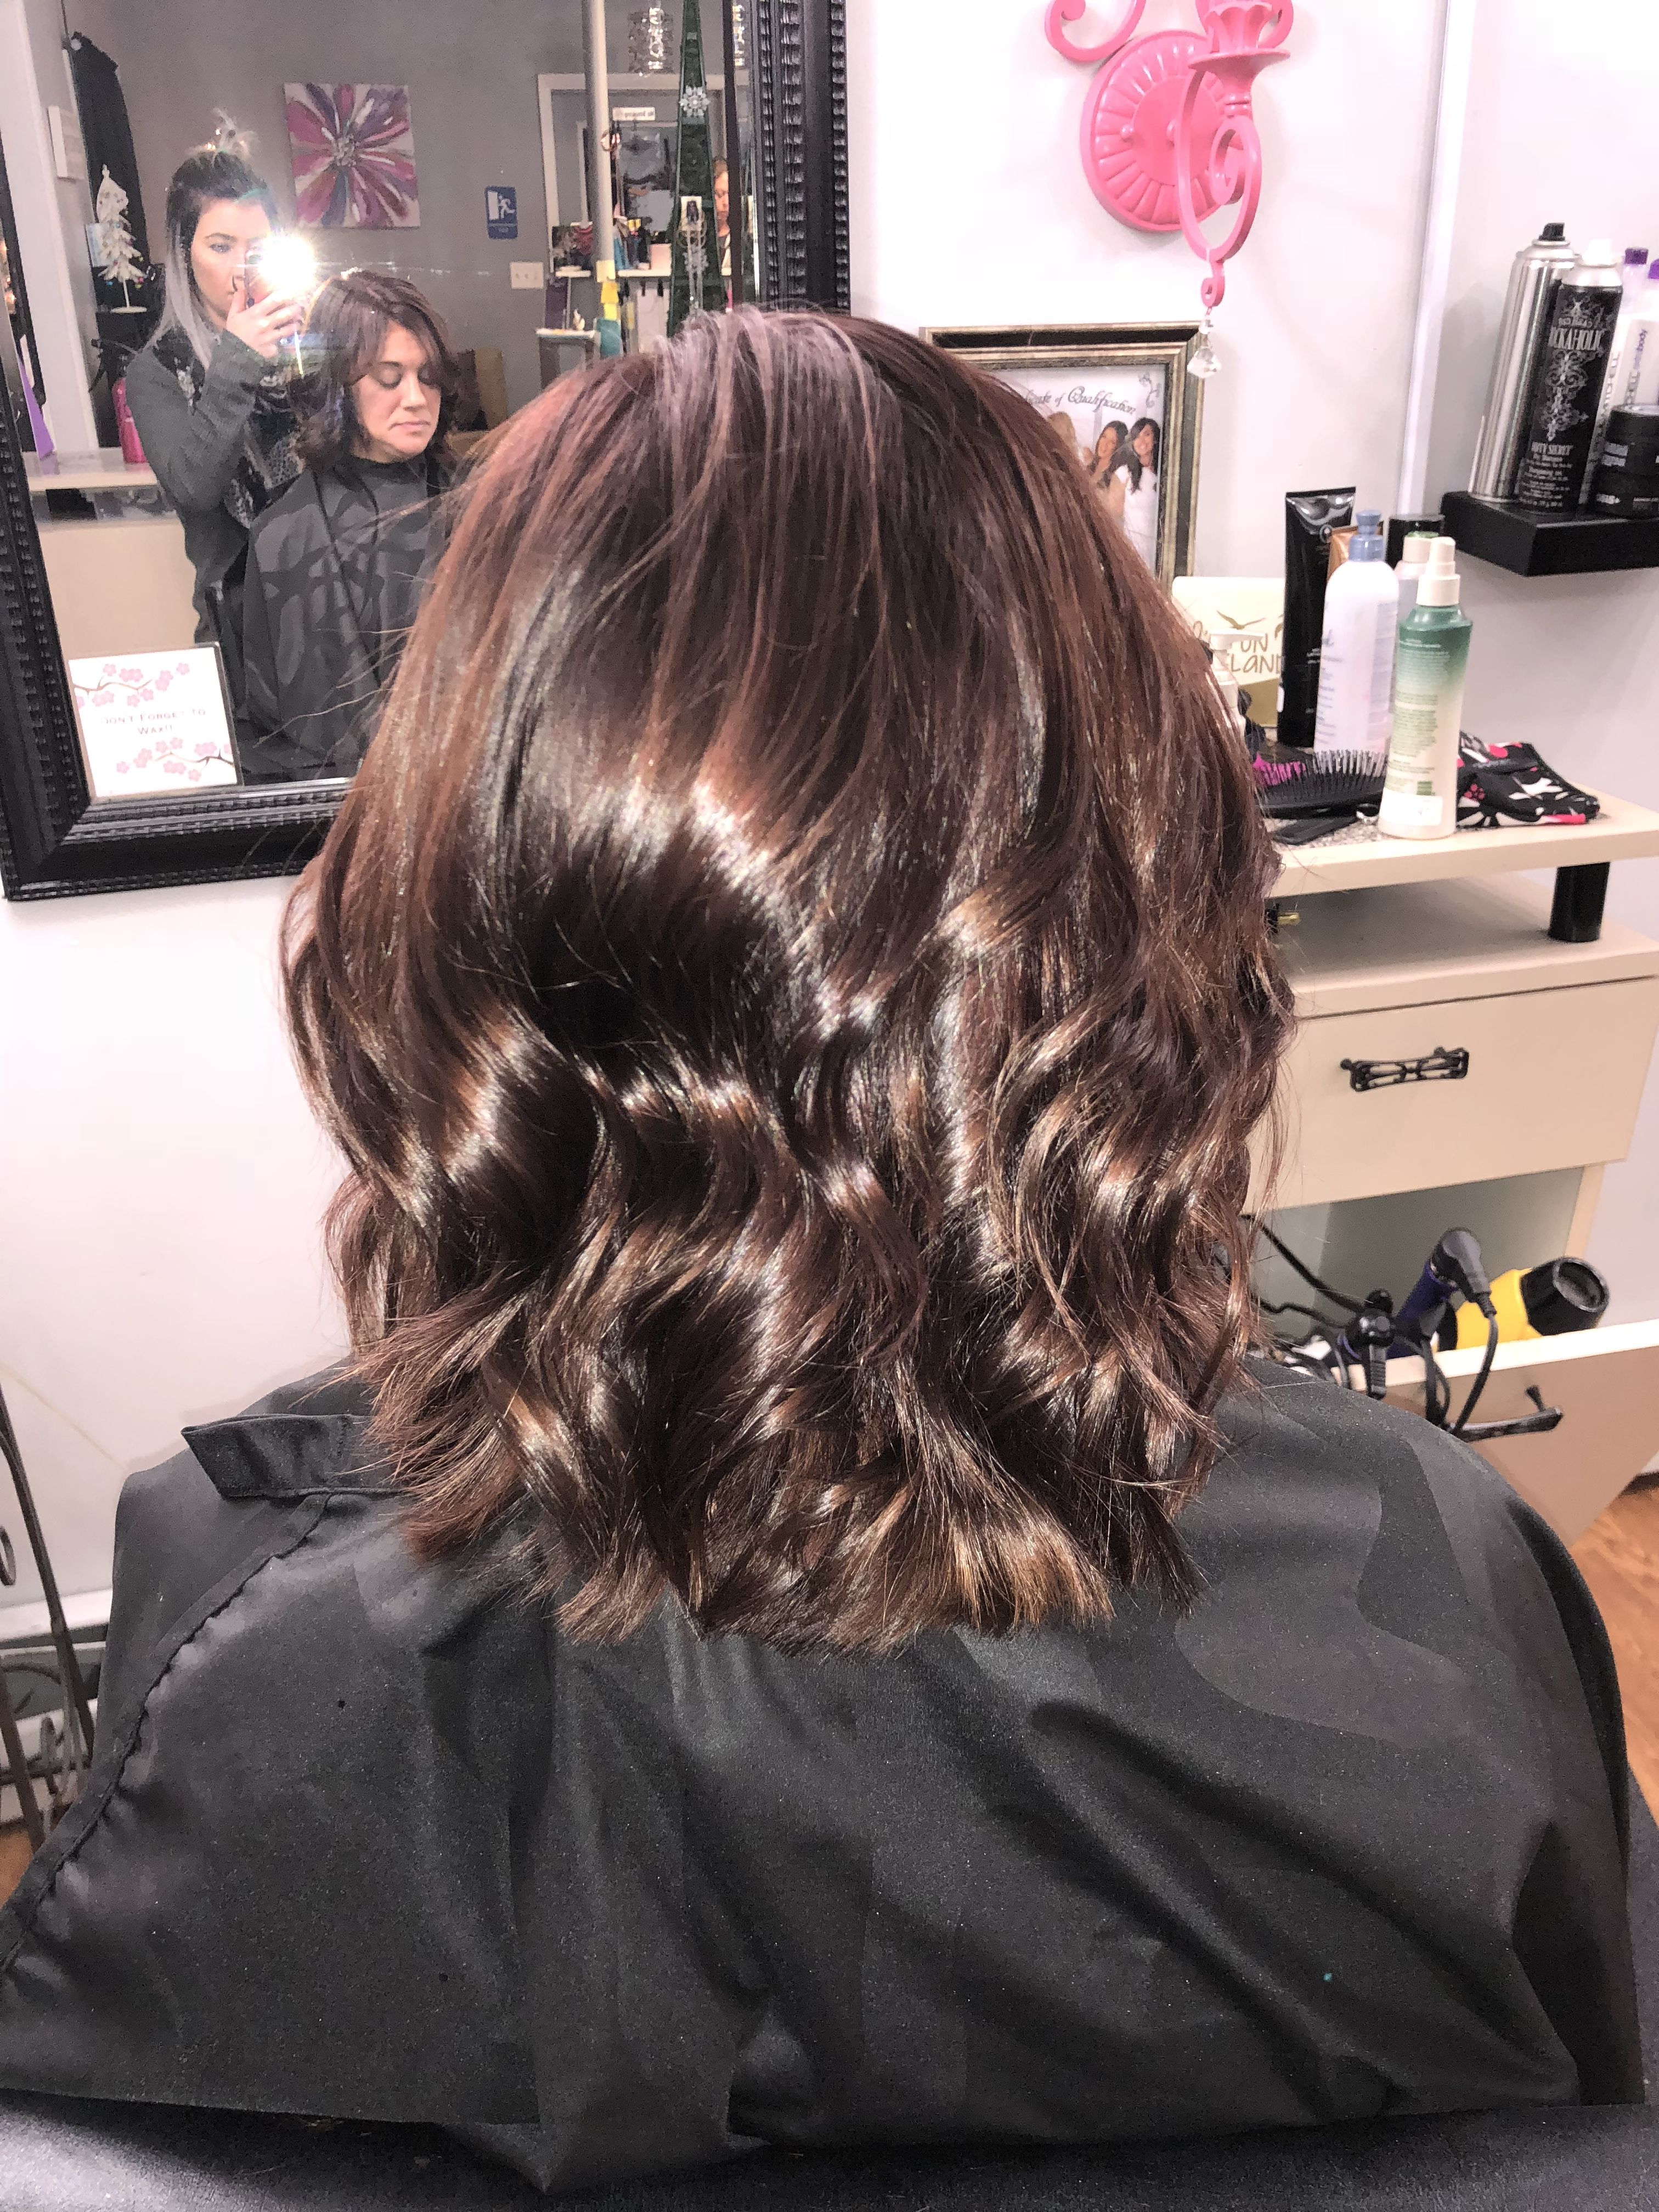 All Nutrient 5ch And 6rm Teasedhairandbodystudio Curls Chocolatehair Brownhair Mediumhair Allnutrient Medium Hair Styles Hair Long Hair Styles